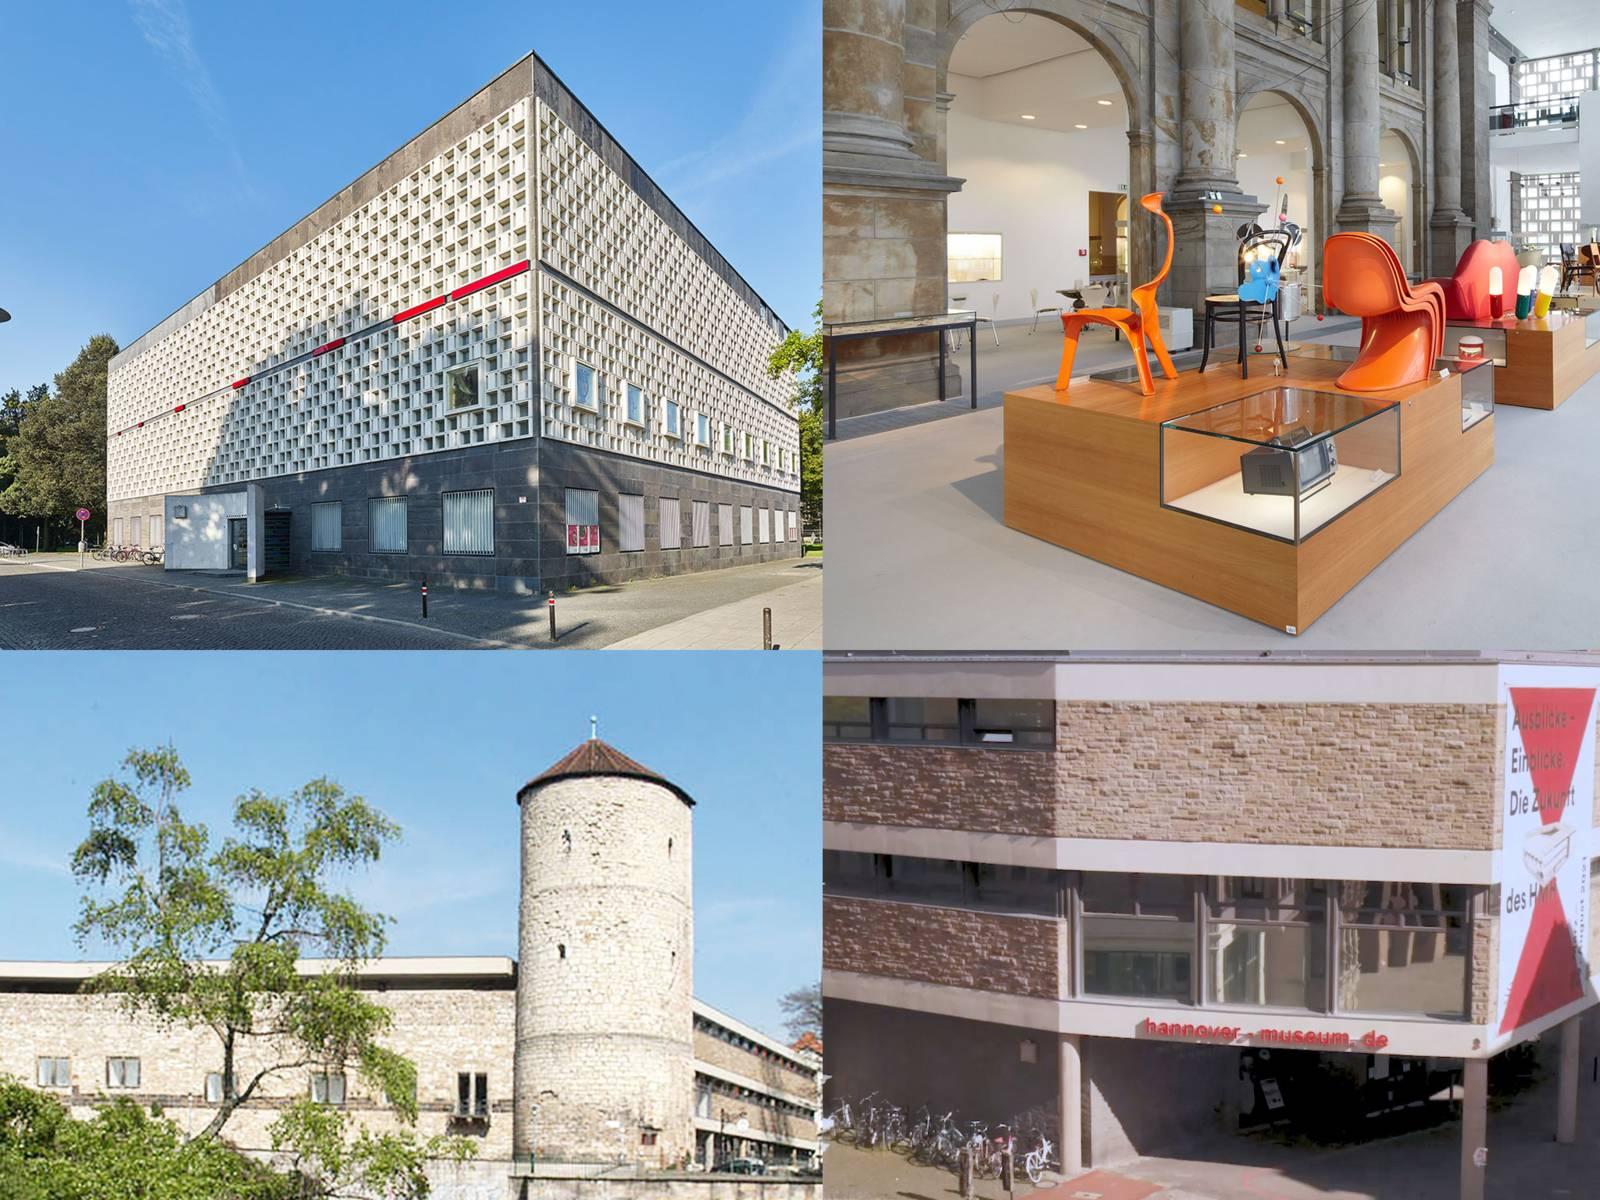 Museum August Kestner & Historisches Museum